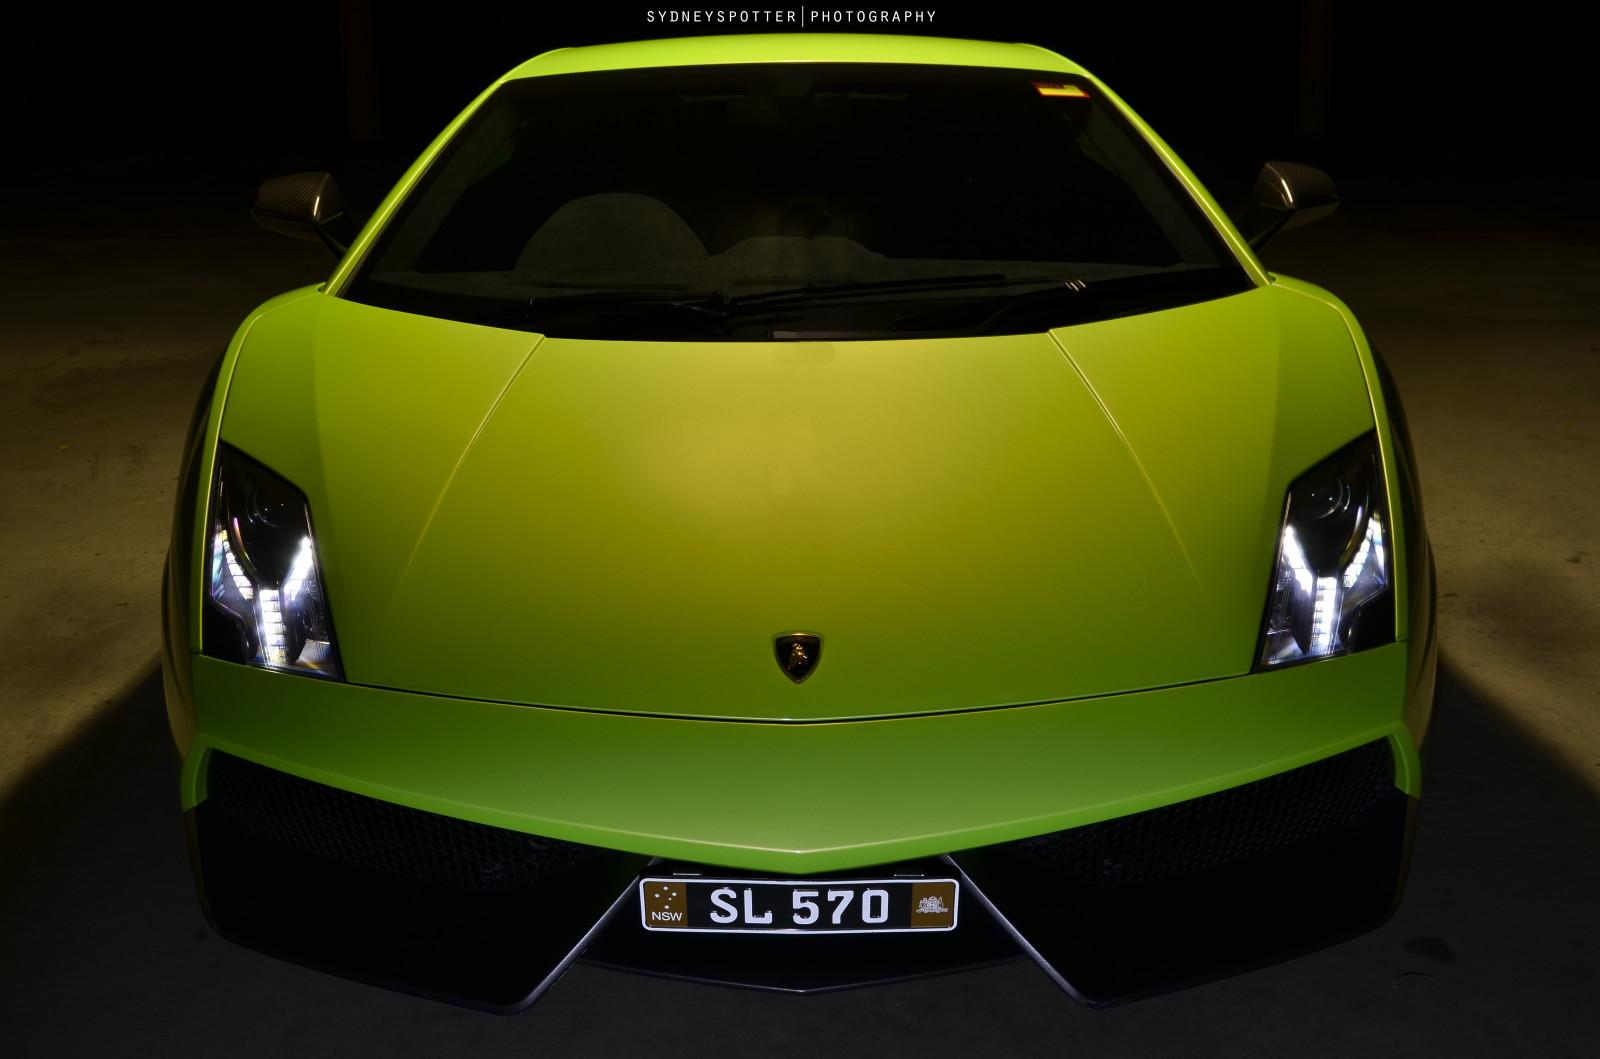 Wallpaper Photography Green Photographer Nikon Lamborghini